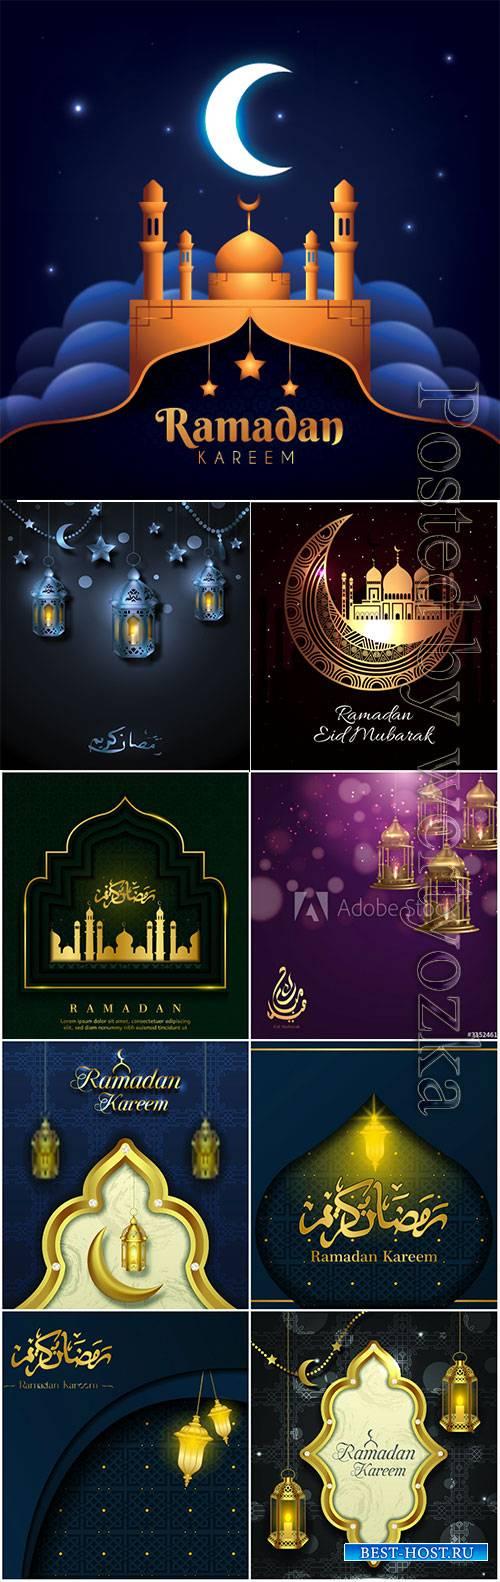 Ramadan Kareem vector background, Eid mubarak greeting card # 3